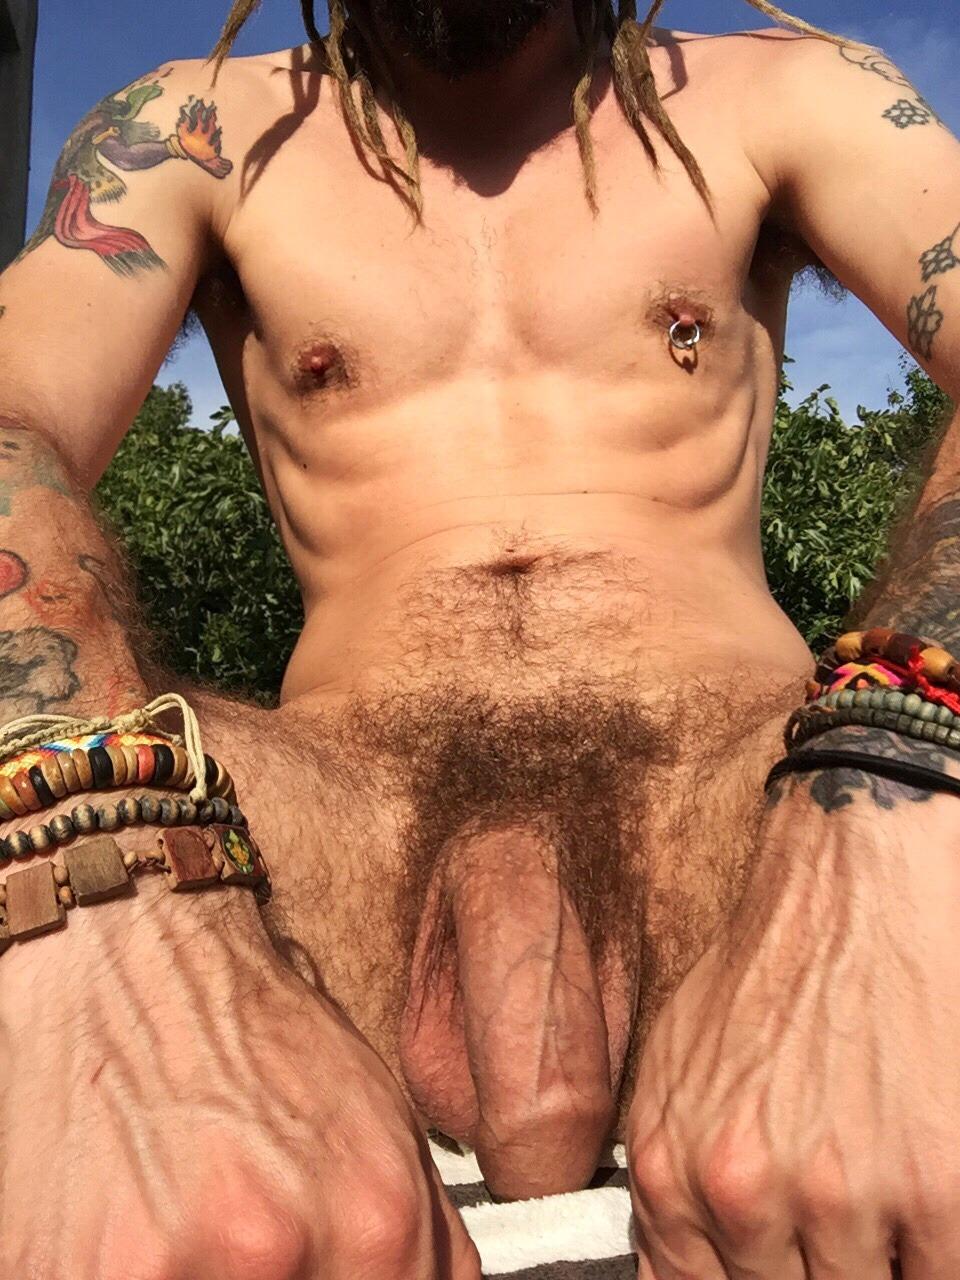 gay hot daddy dude men porn str8 cruising sexting cock